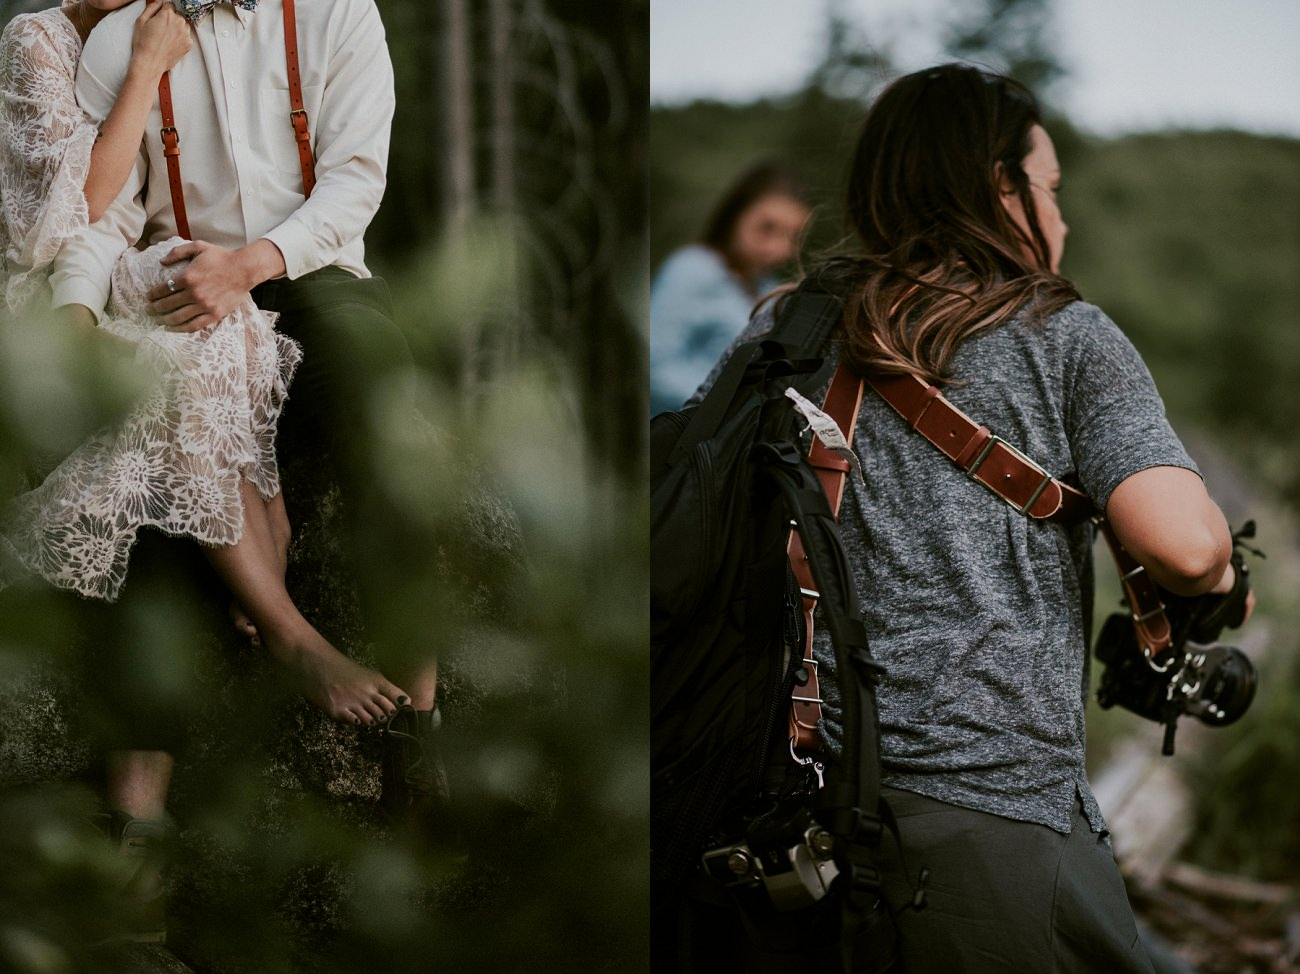 Moody Elopement - Mountain Elopement in Leavenworth Washington - Seattle Washington Photographer